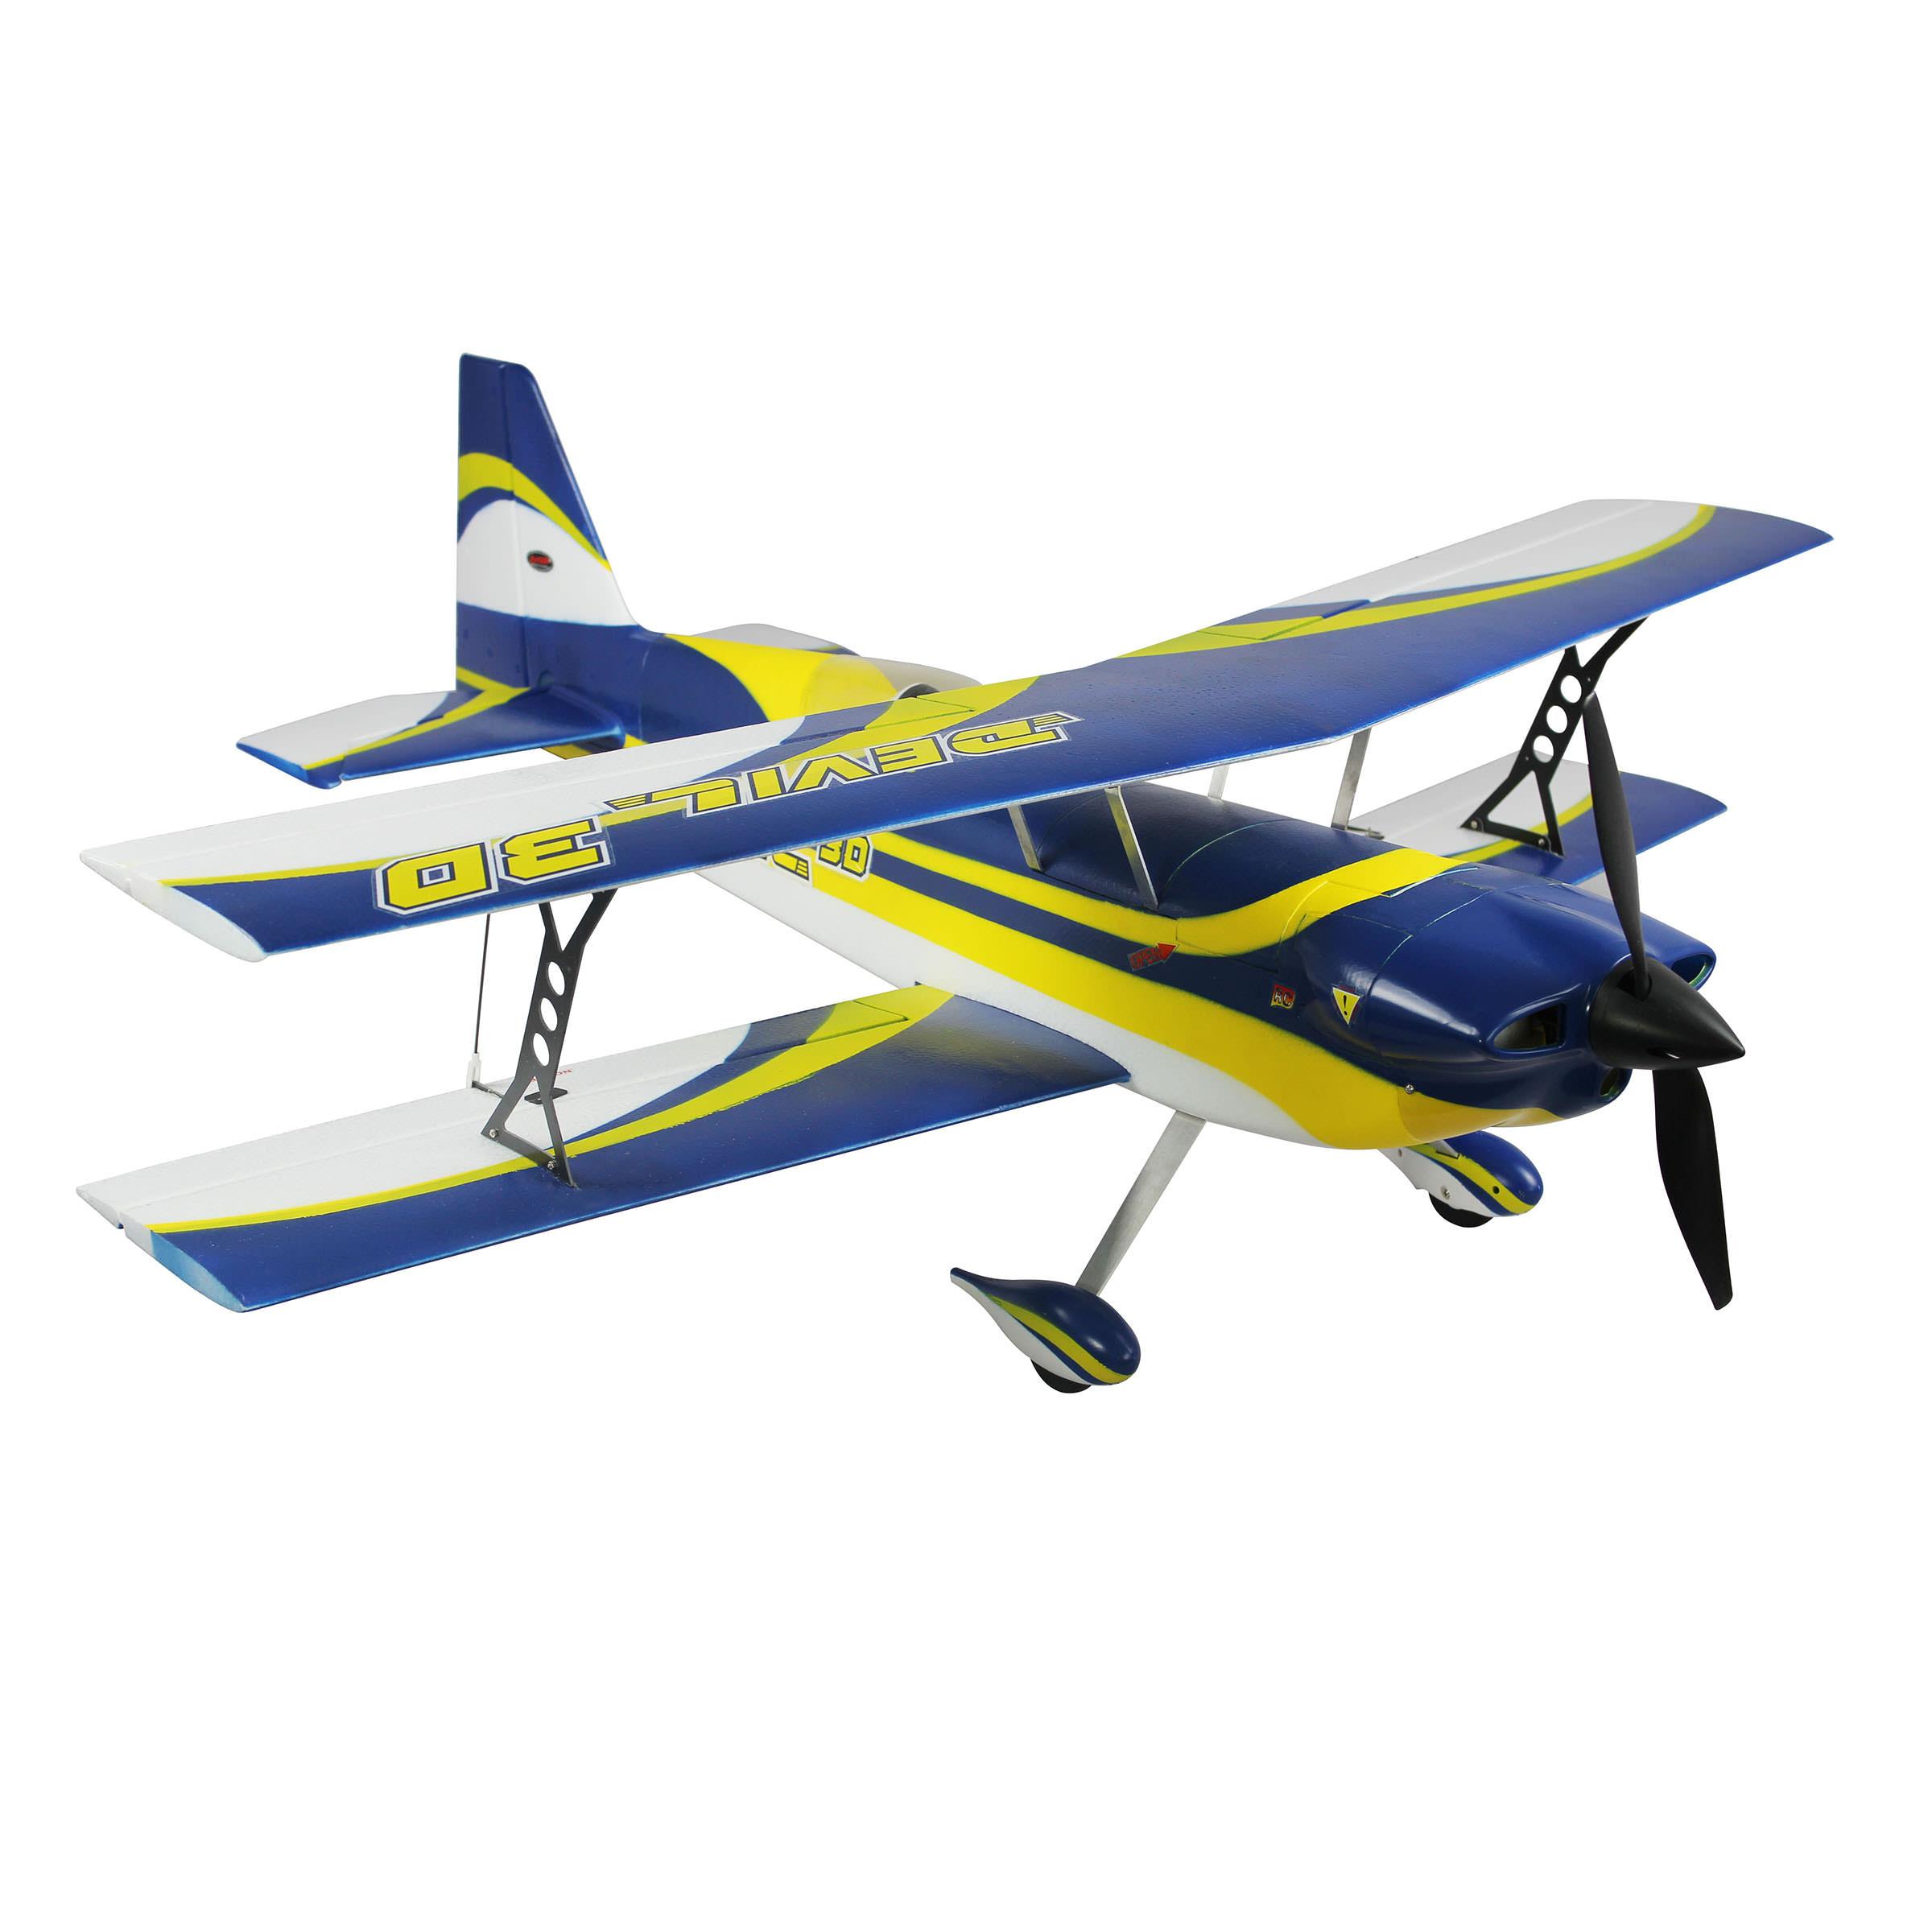 Dynam 8954 Devil 3d Rc Biplane At Hobby Warehouse